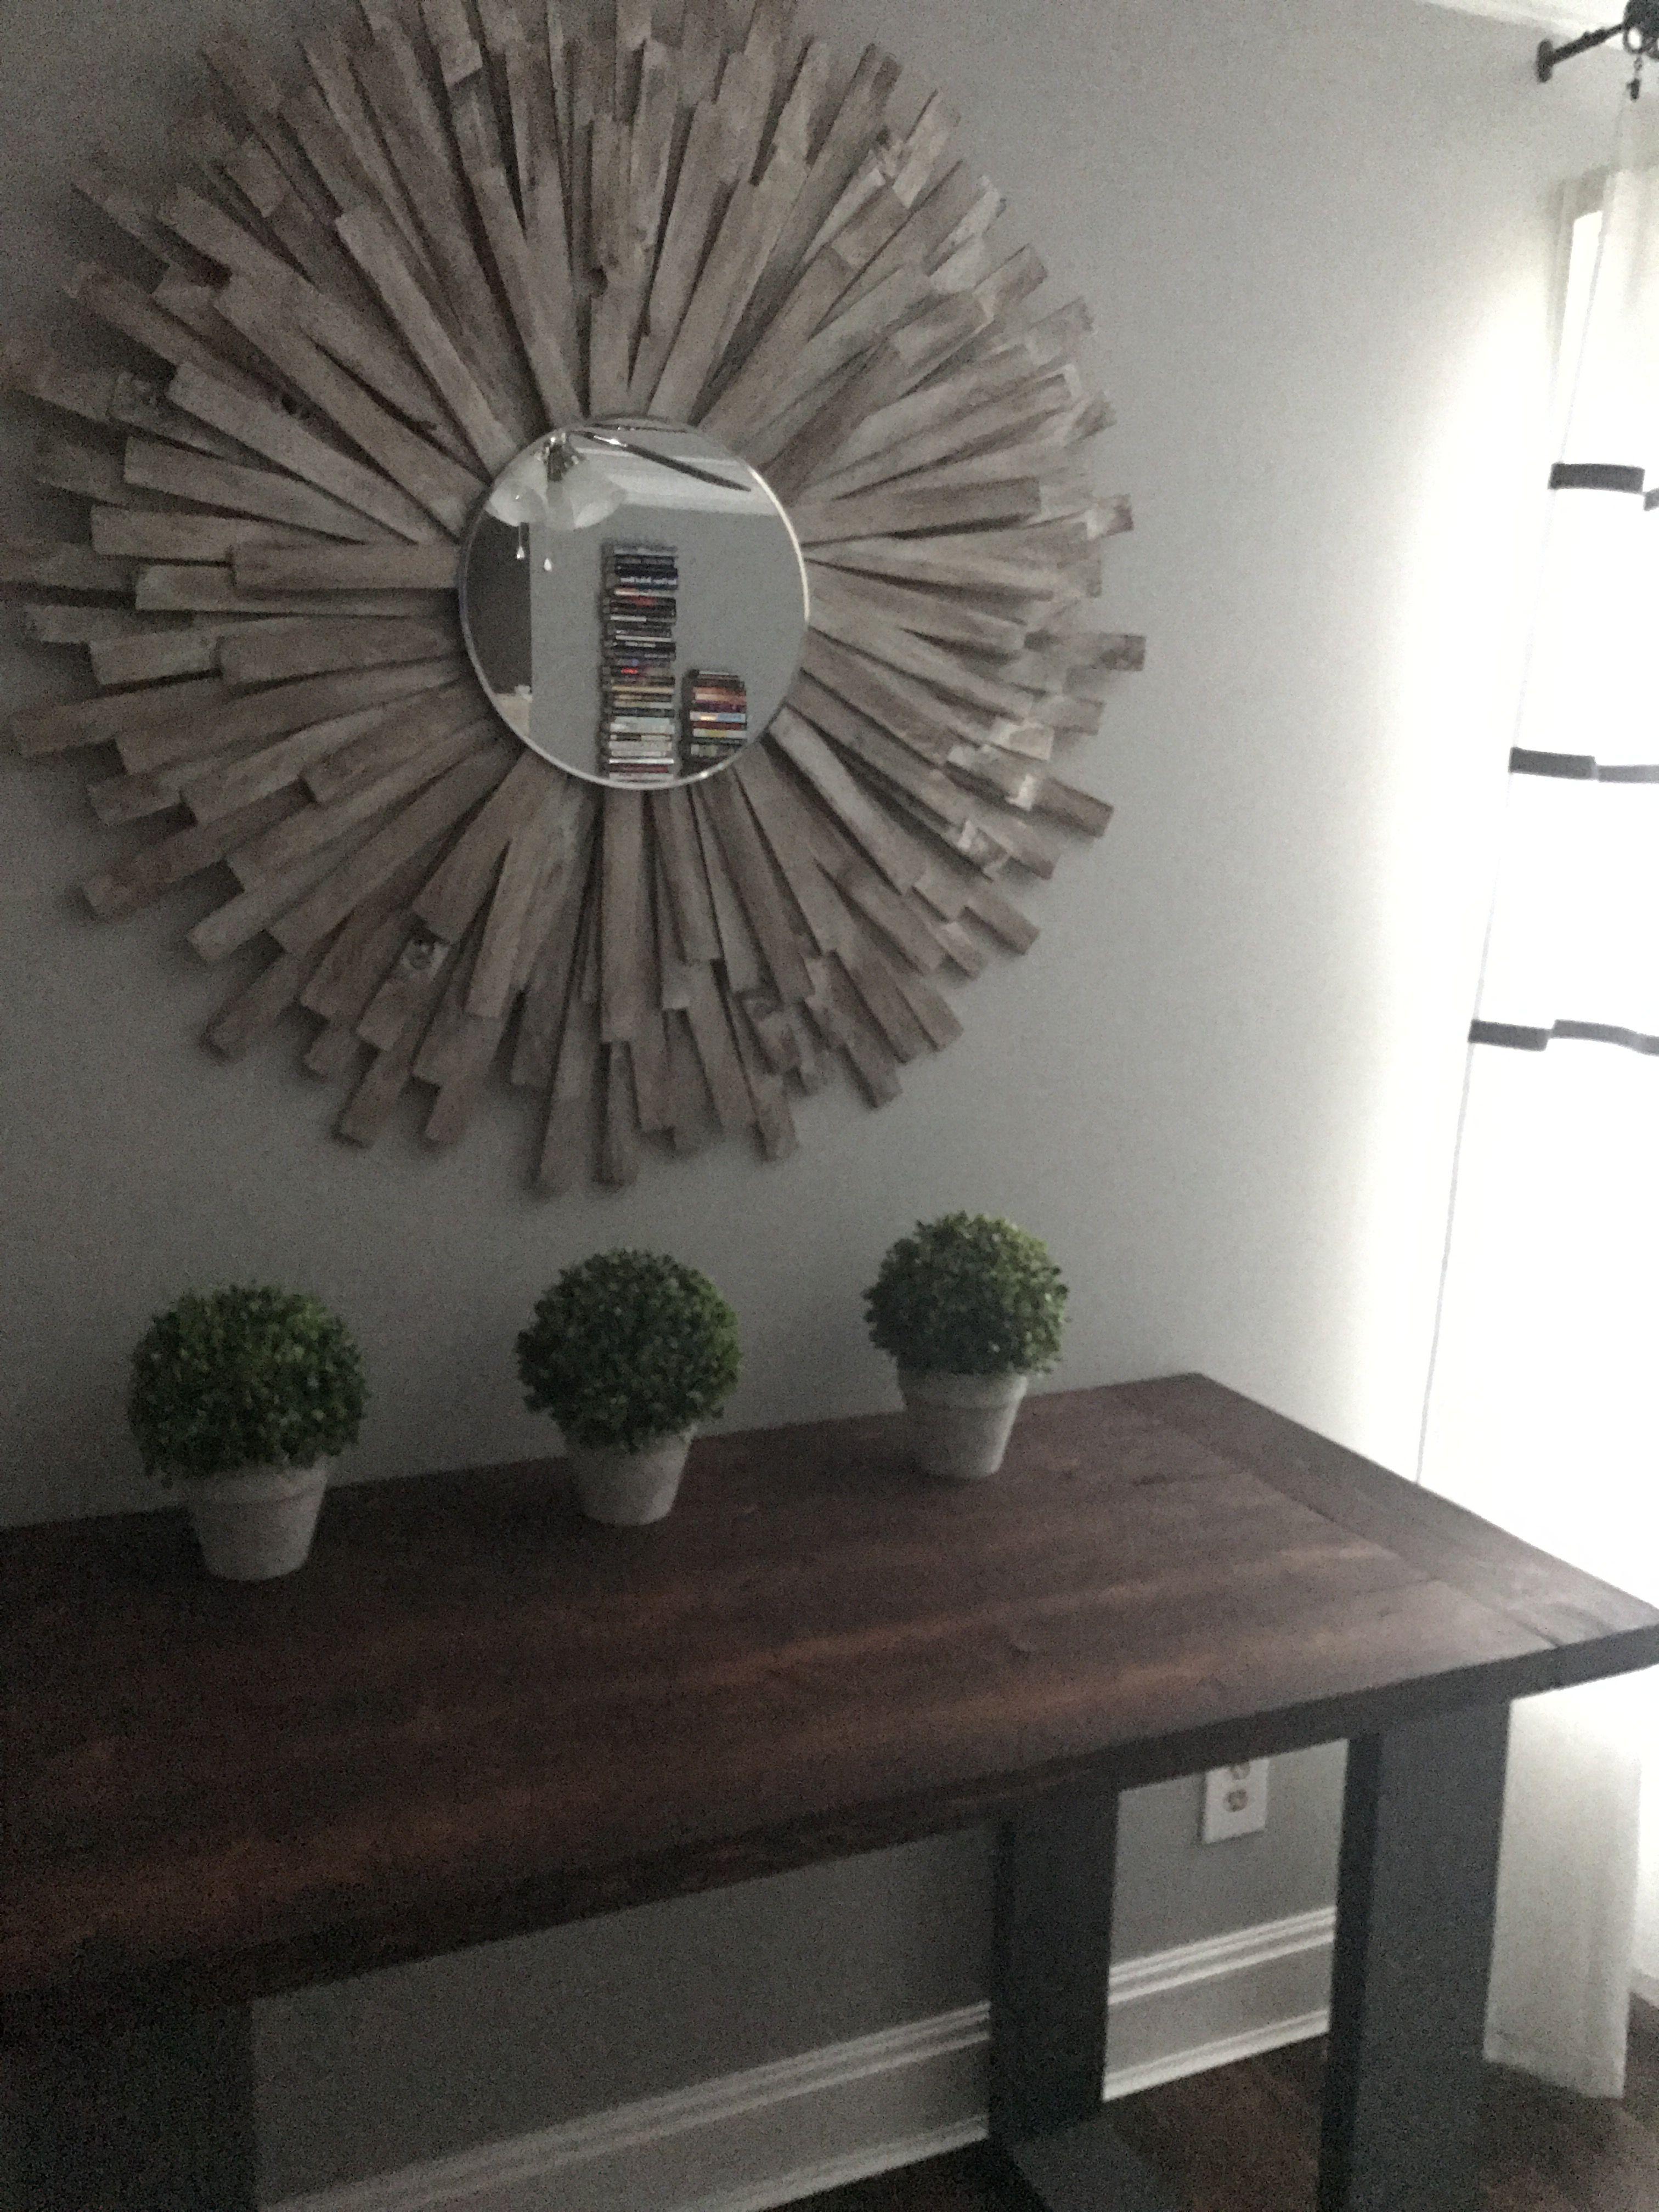 Sunburst Mirror Diy Cheap And Creative Wall Art With Wood Shims